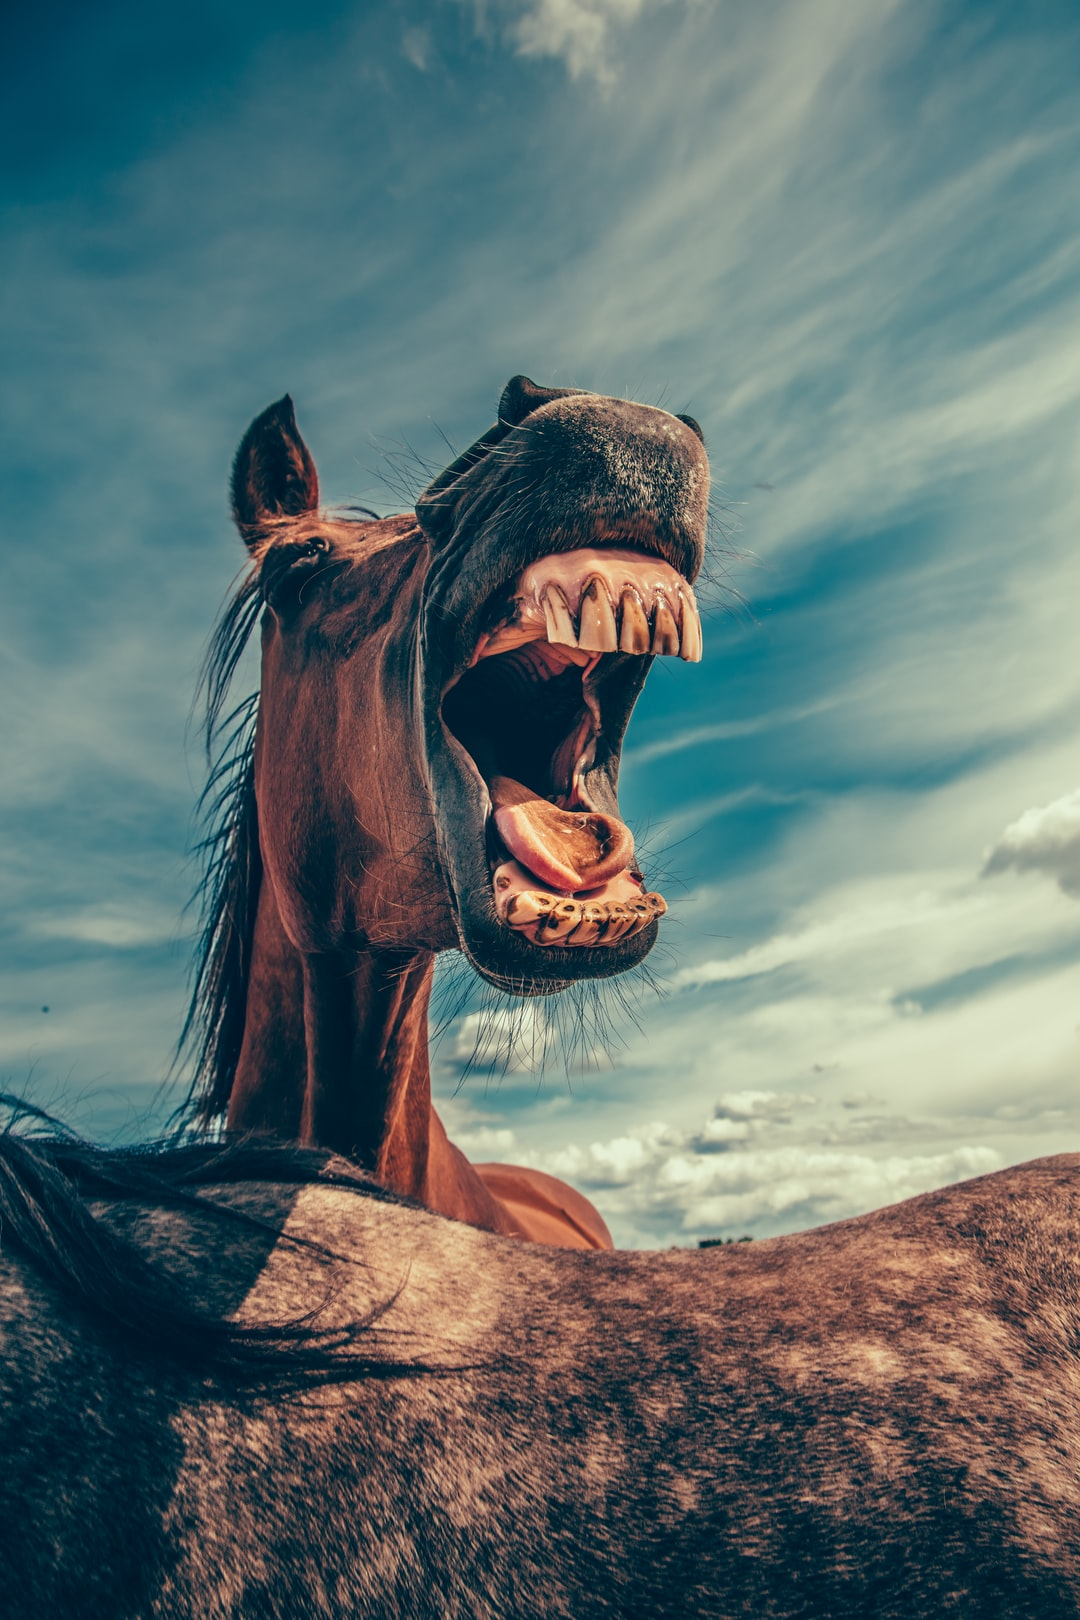 Horse baring its teeth